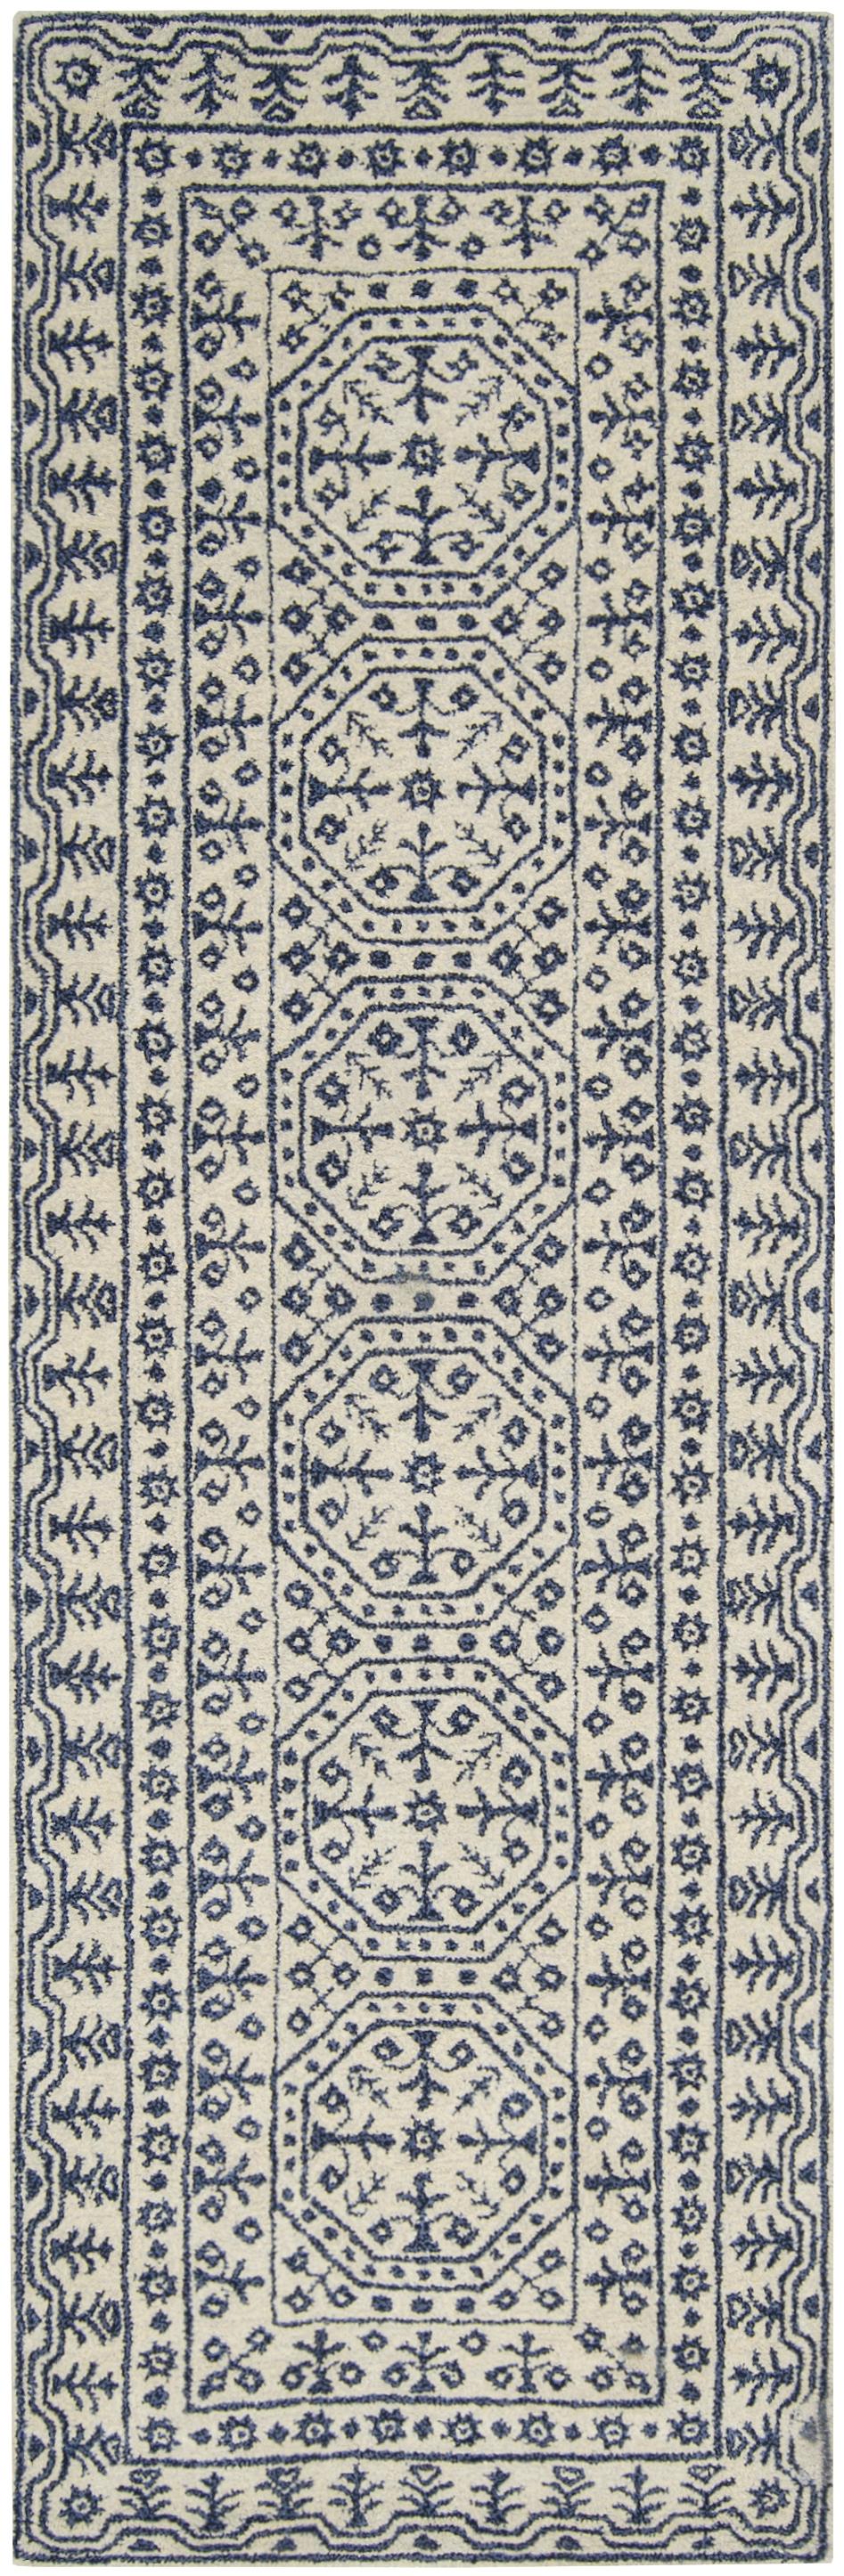 Navy, Beige Traditional / Oriental Area Rug